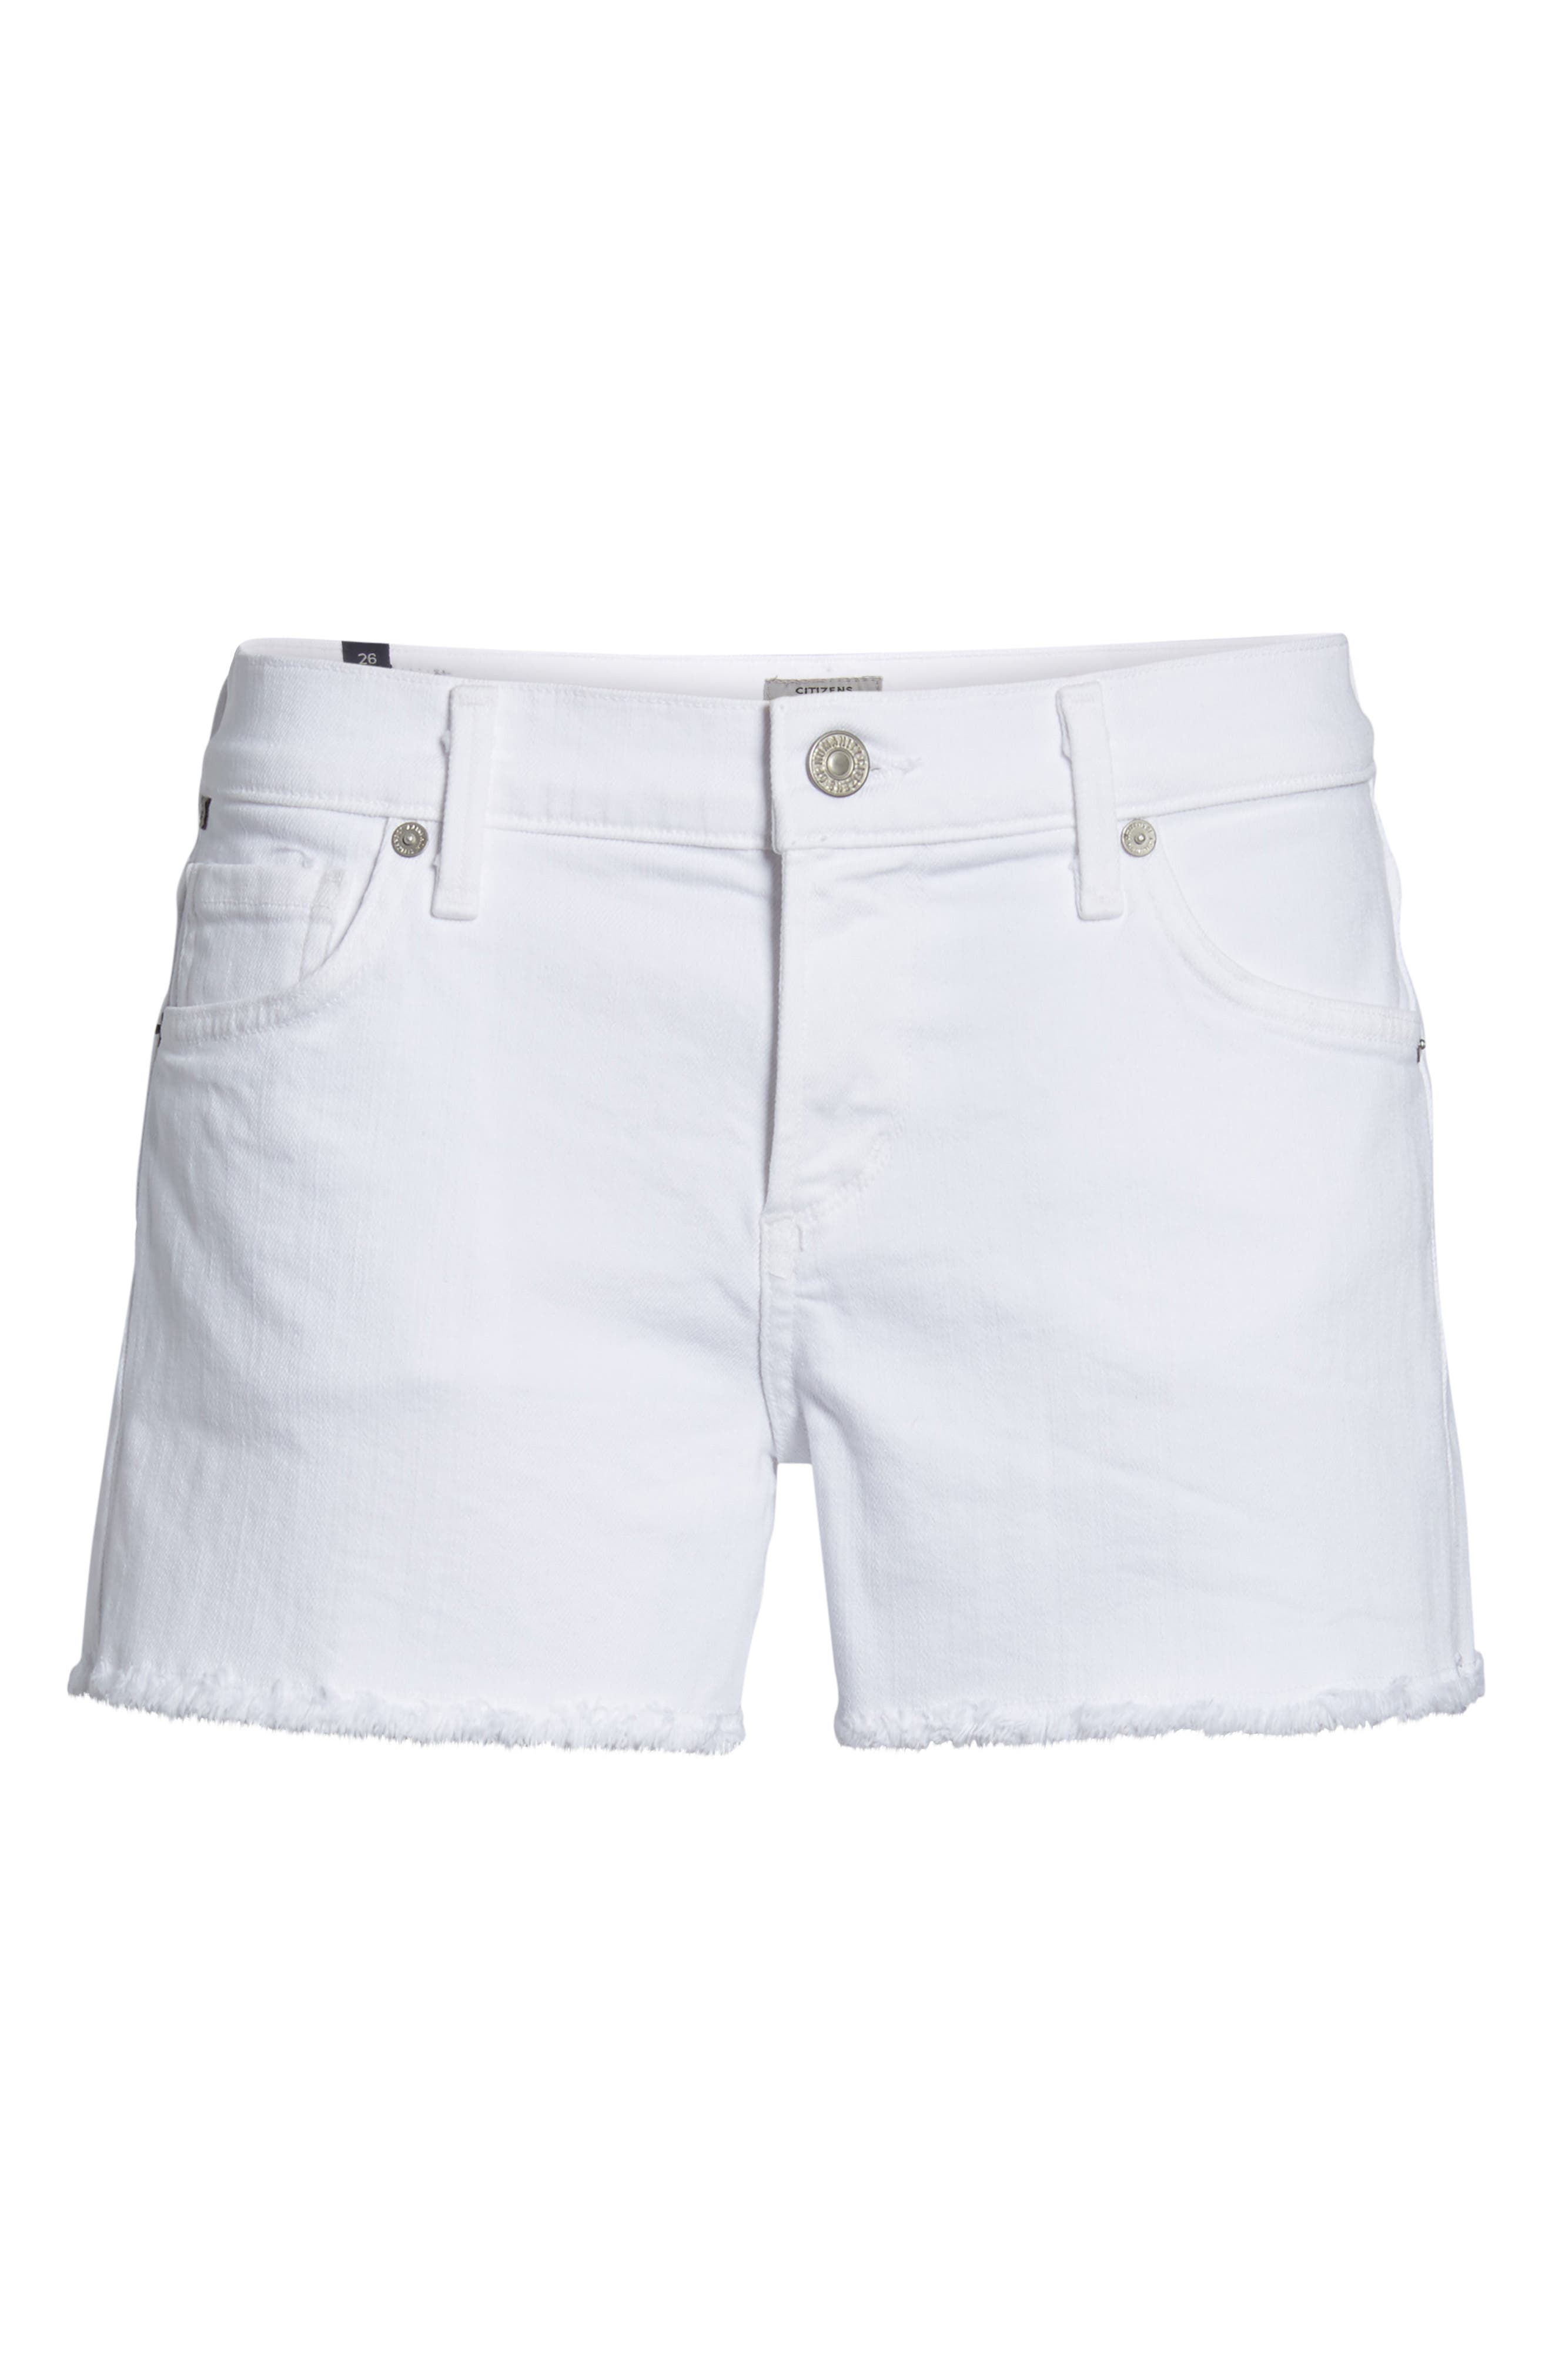 Ava Cutoff Denim Shorts,                             Alternate thumbnail 7, color,                             104